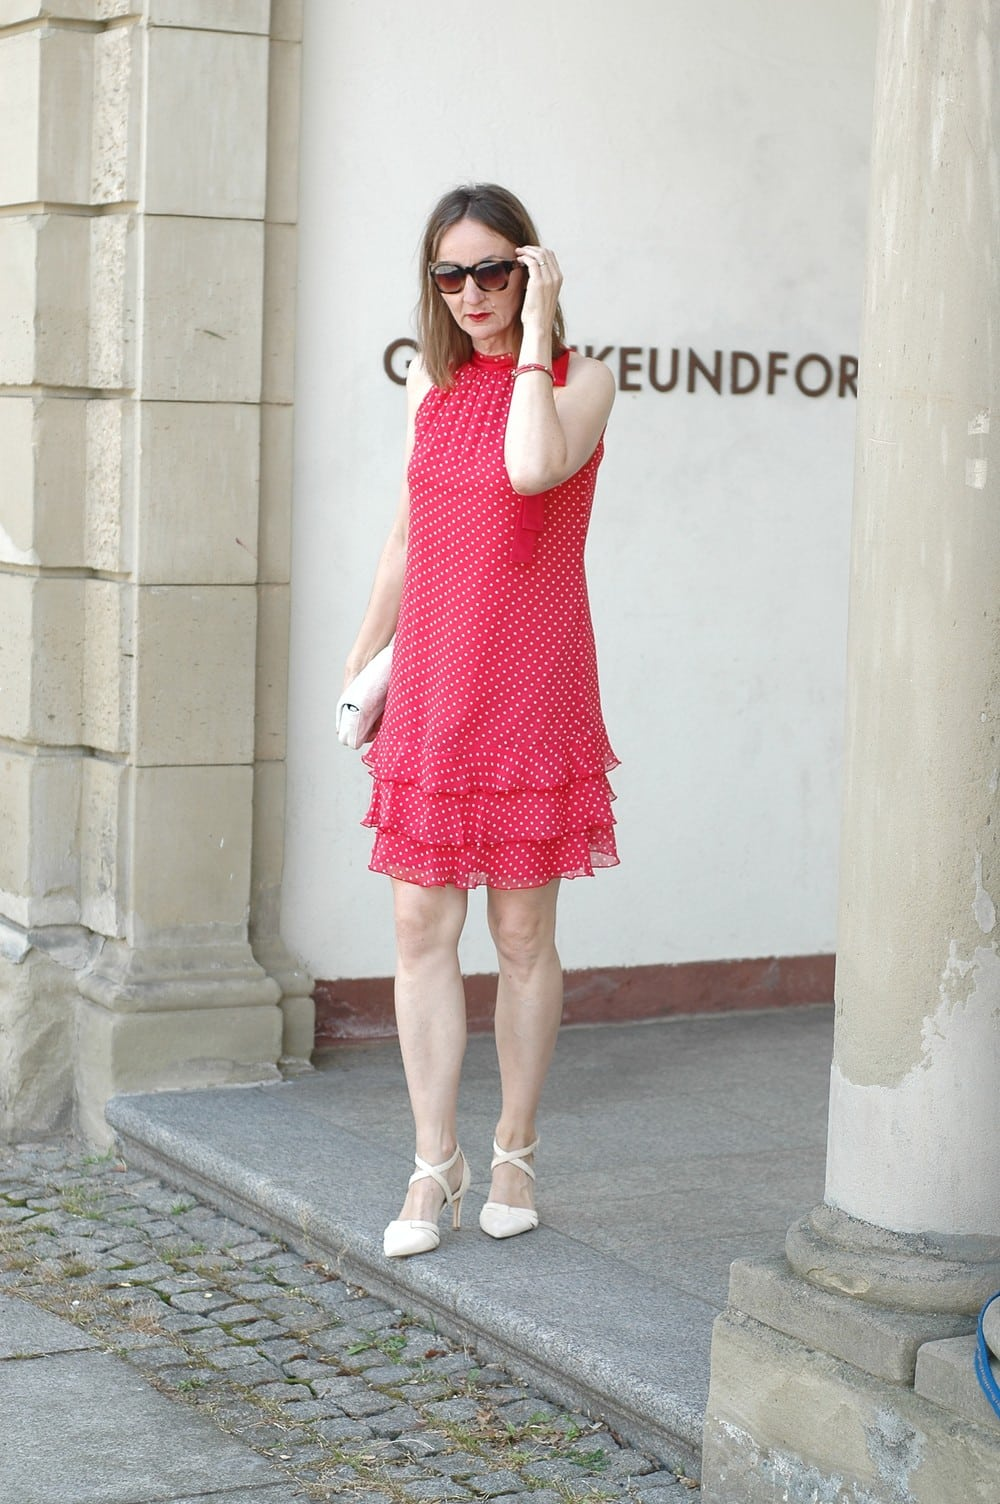 kurzes-Sommerkleid-ue50-tragen_gepunktet-volants_mode-blog_oceanblue-style.jpg